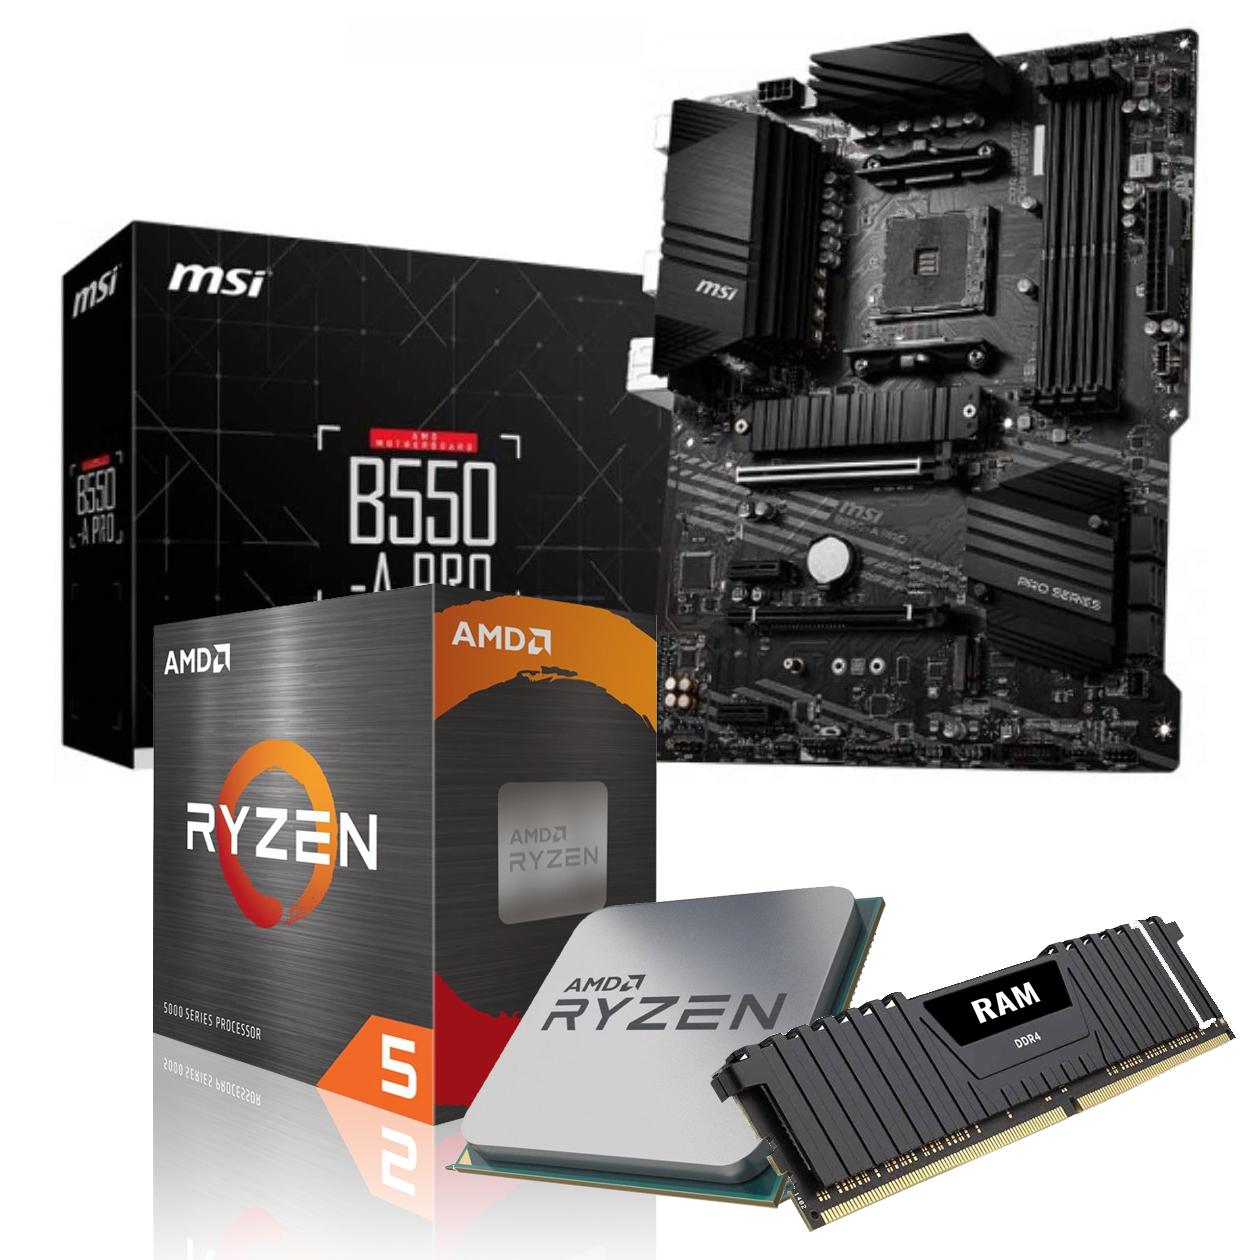 Vormontiertes Aufrüst-Kit: MSI B550-A Pro + AMD Ryzen 5 5600X (inkl. Kühler) + 16GB DDR4-3200 (2x 8GB Dual Channel)